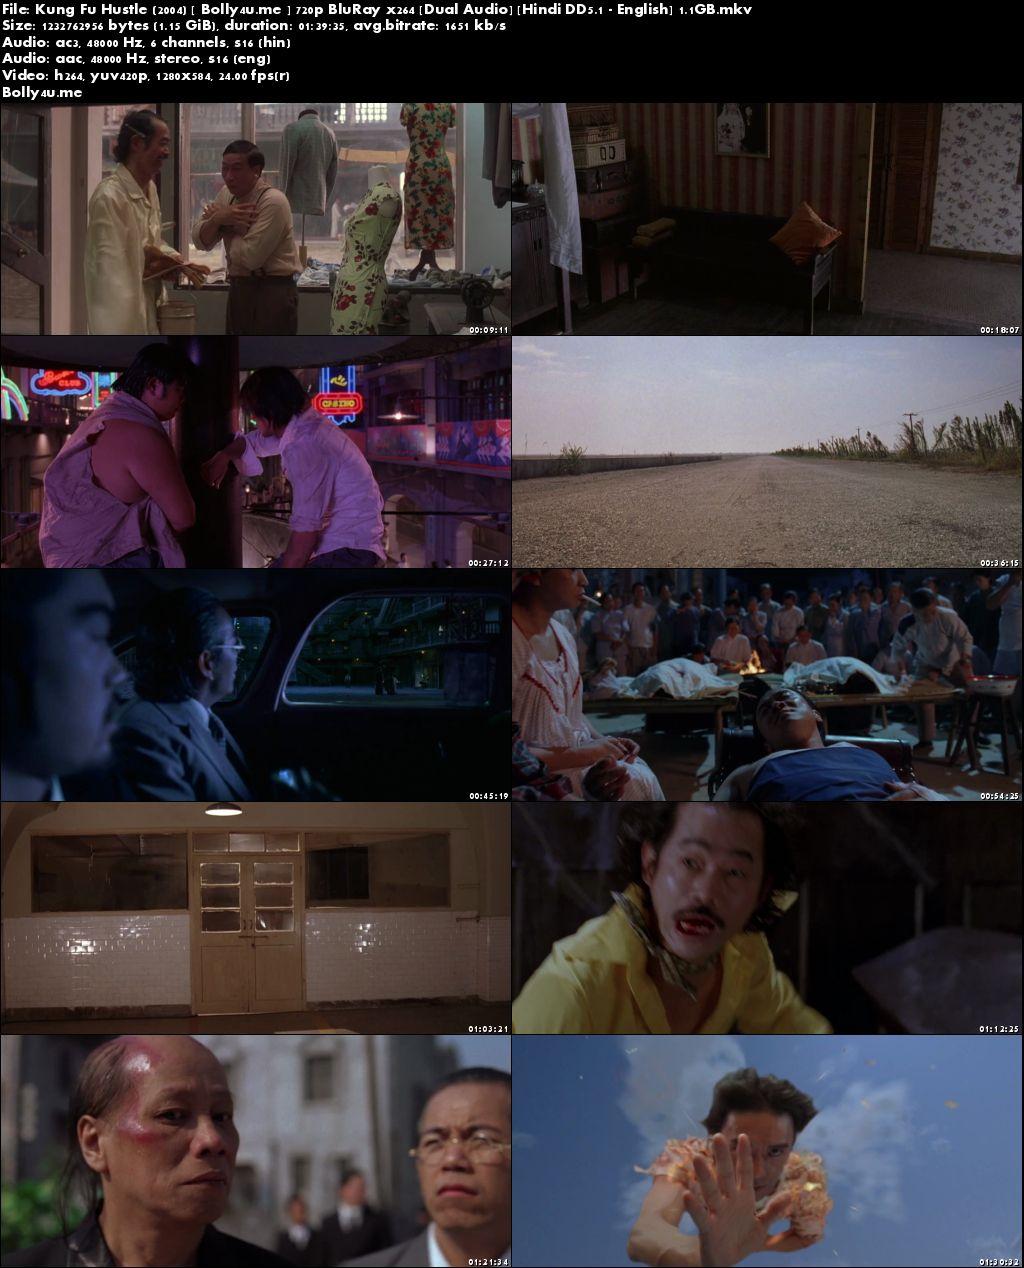 Kung fu hustle full movie hindi dubbed download 720p subtitle